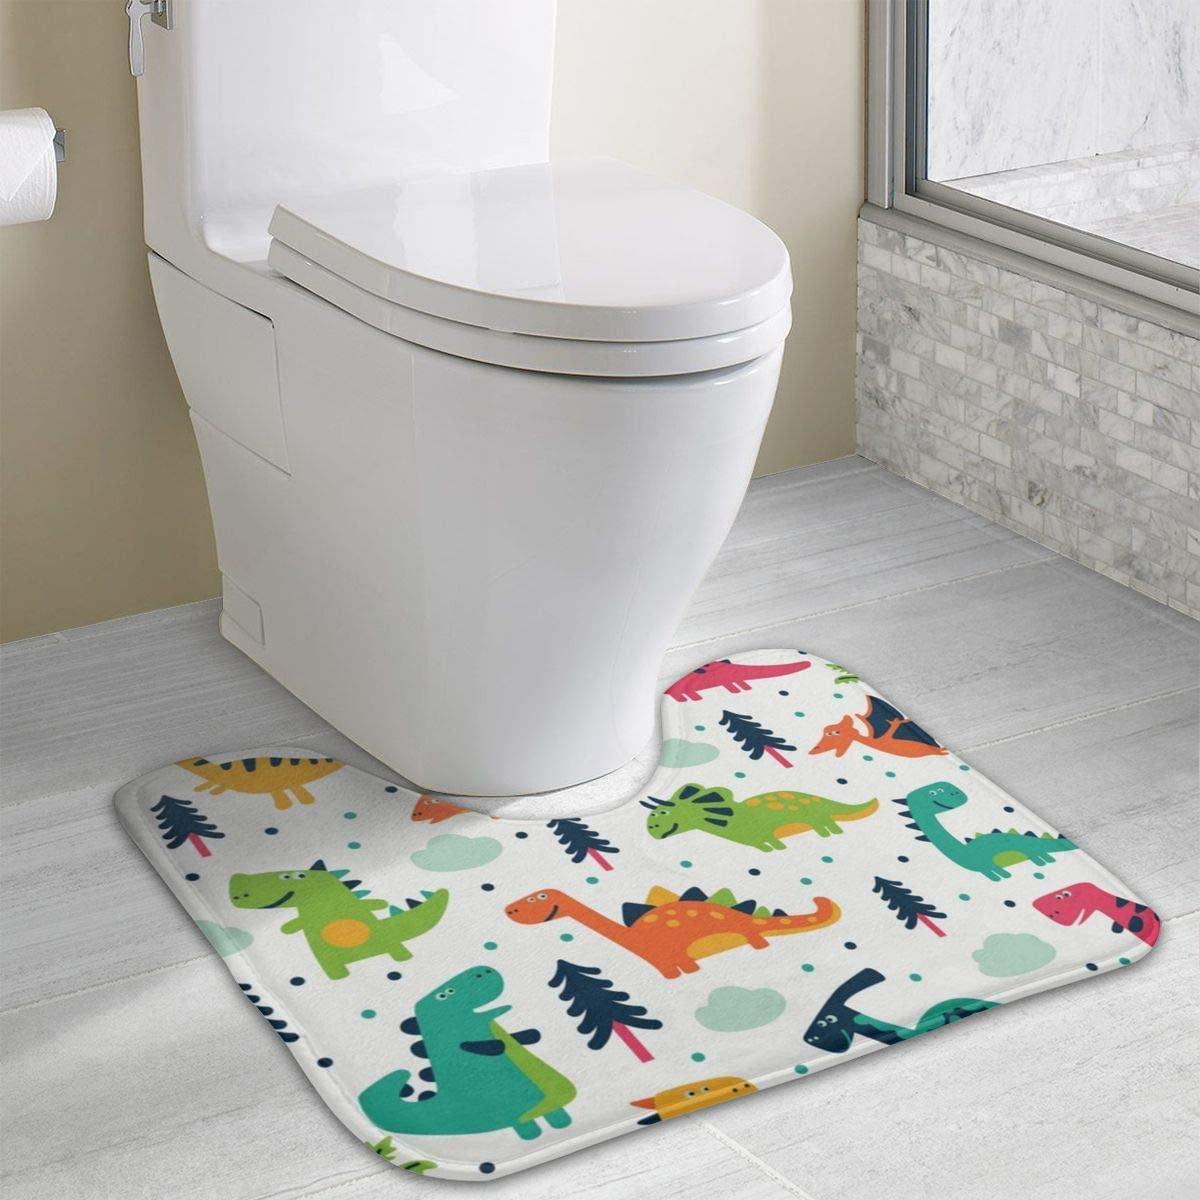 NiYoung Contour Bath Rug,U-Shaped Toilet Contour Rug Toilet Mat Bath Mat Non Slip Bathroom Rug 15.8x19.3 Inches,Cartoon Dinosaur Set